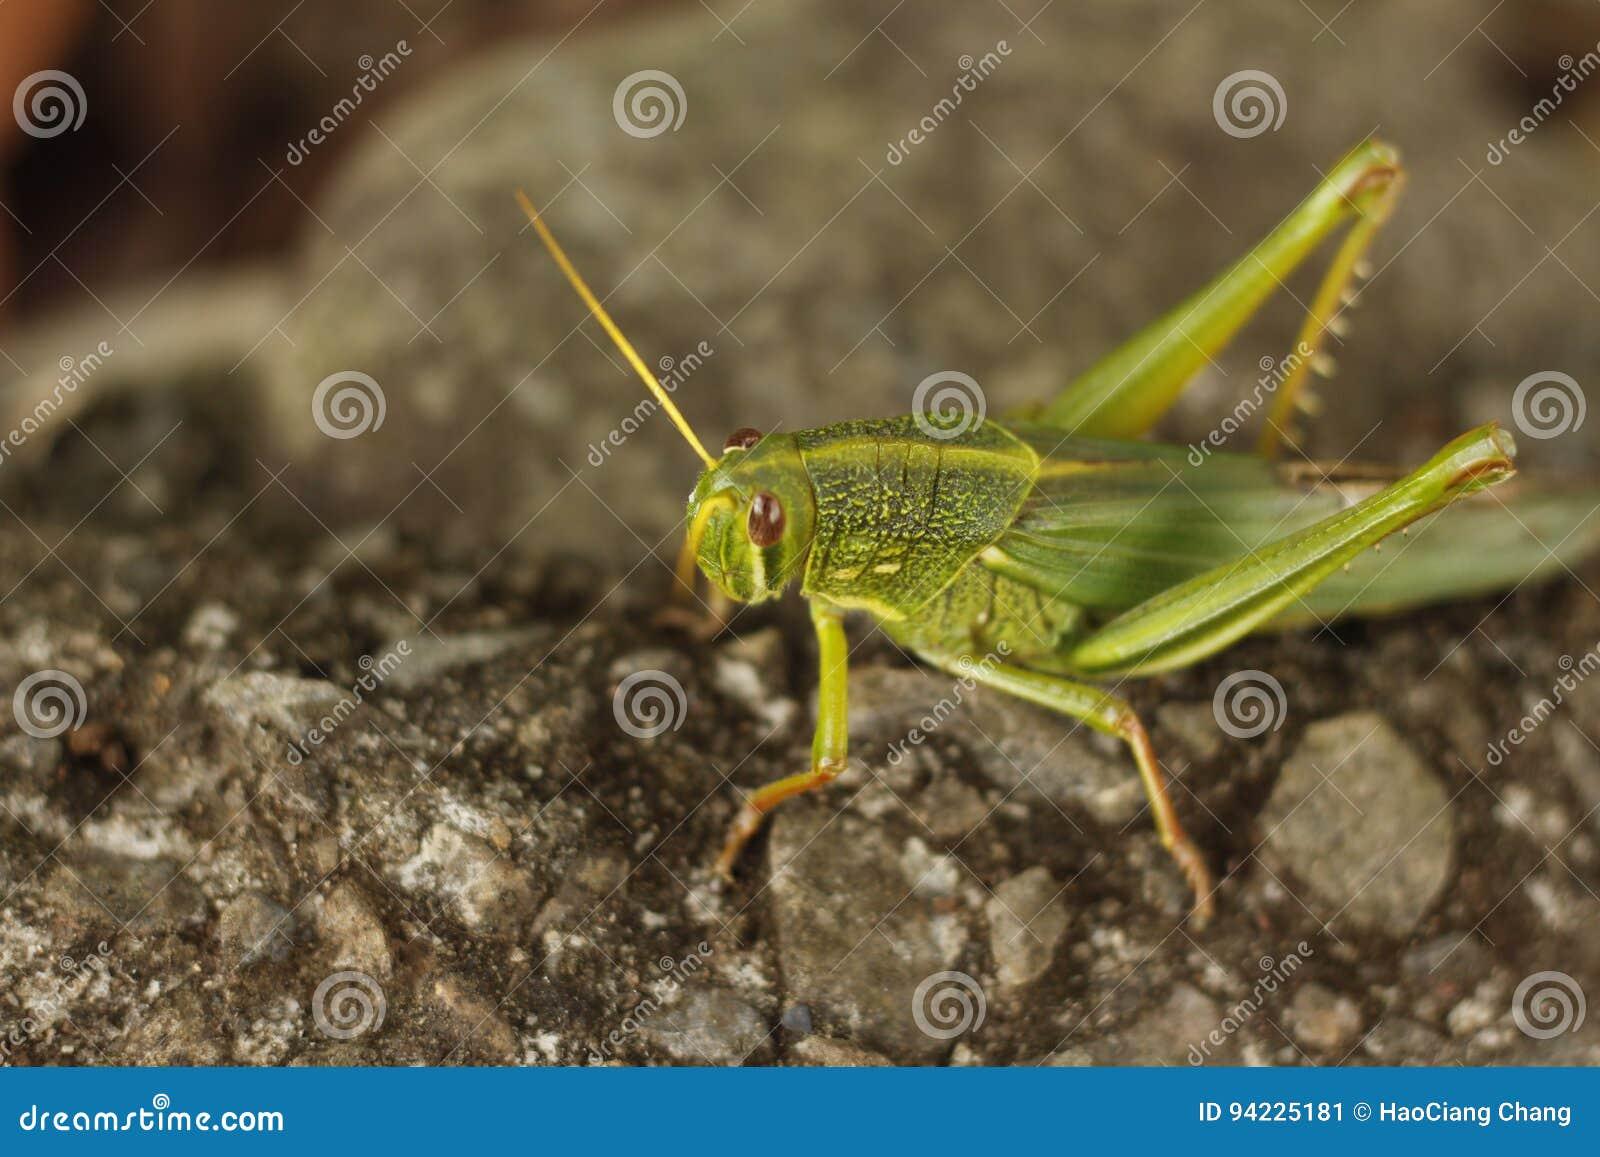 The grasshopper of High angel views